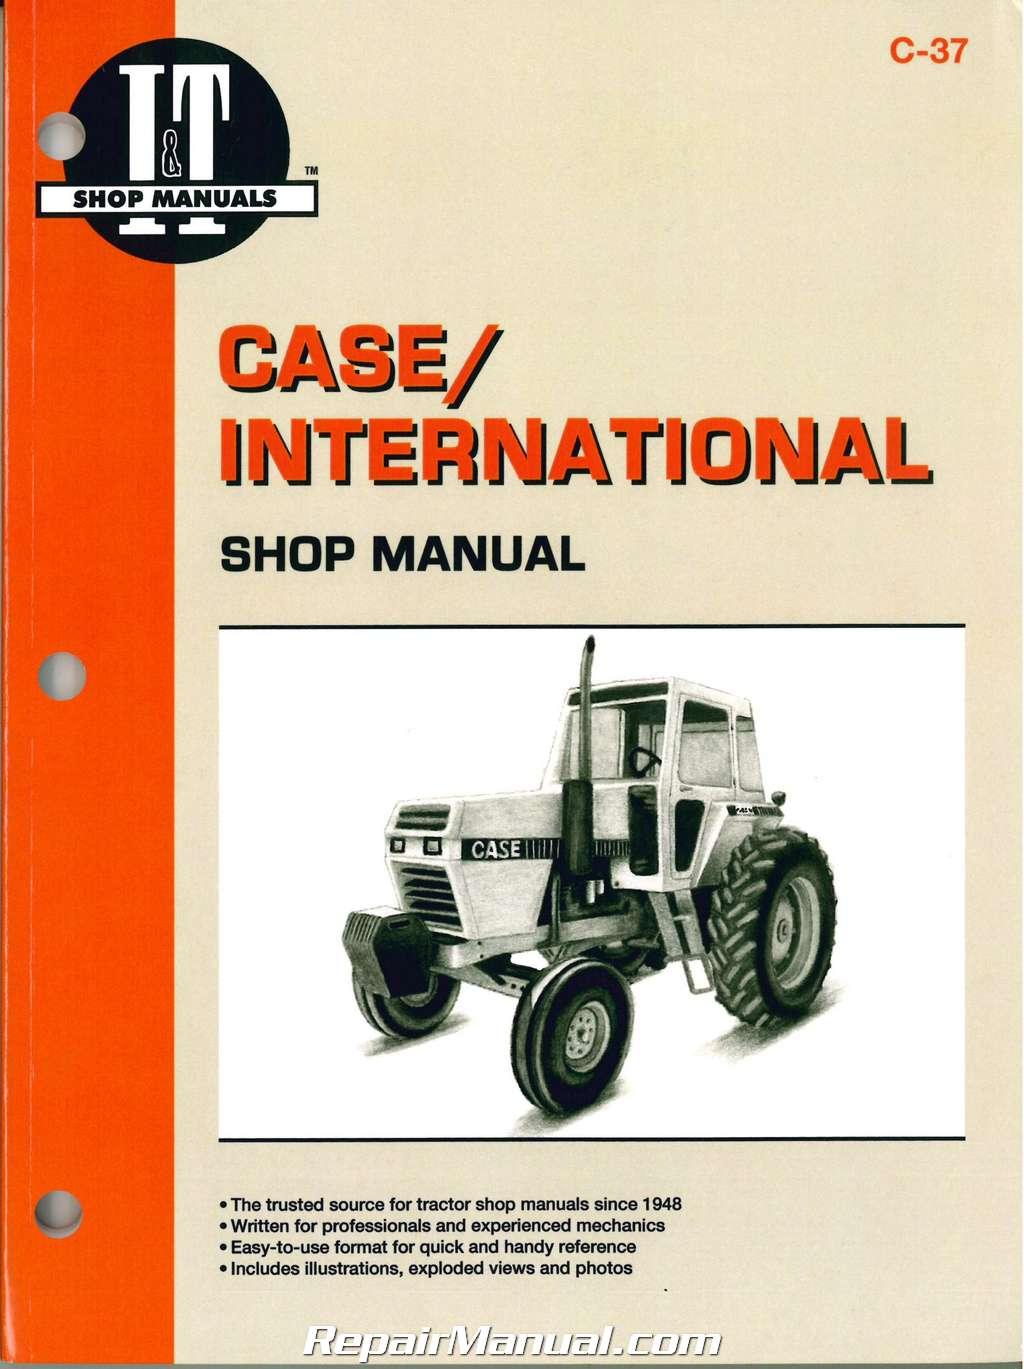 Vintage Tractor Parts Fuel Filter Case International 2090 2094 2290 2294 2390 2394 2590 2594